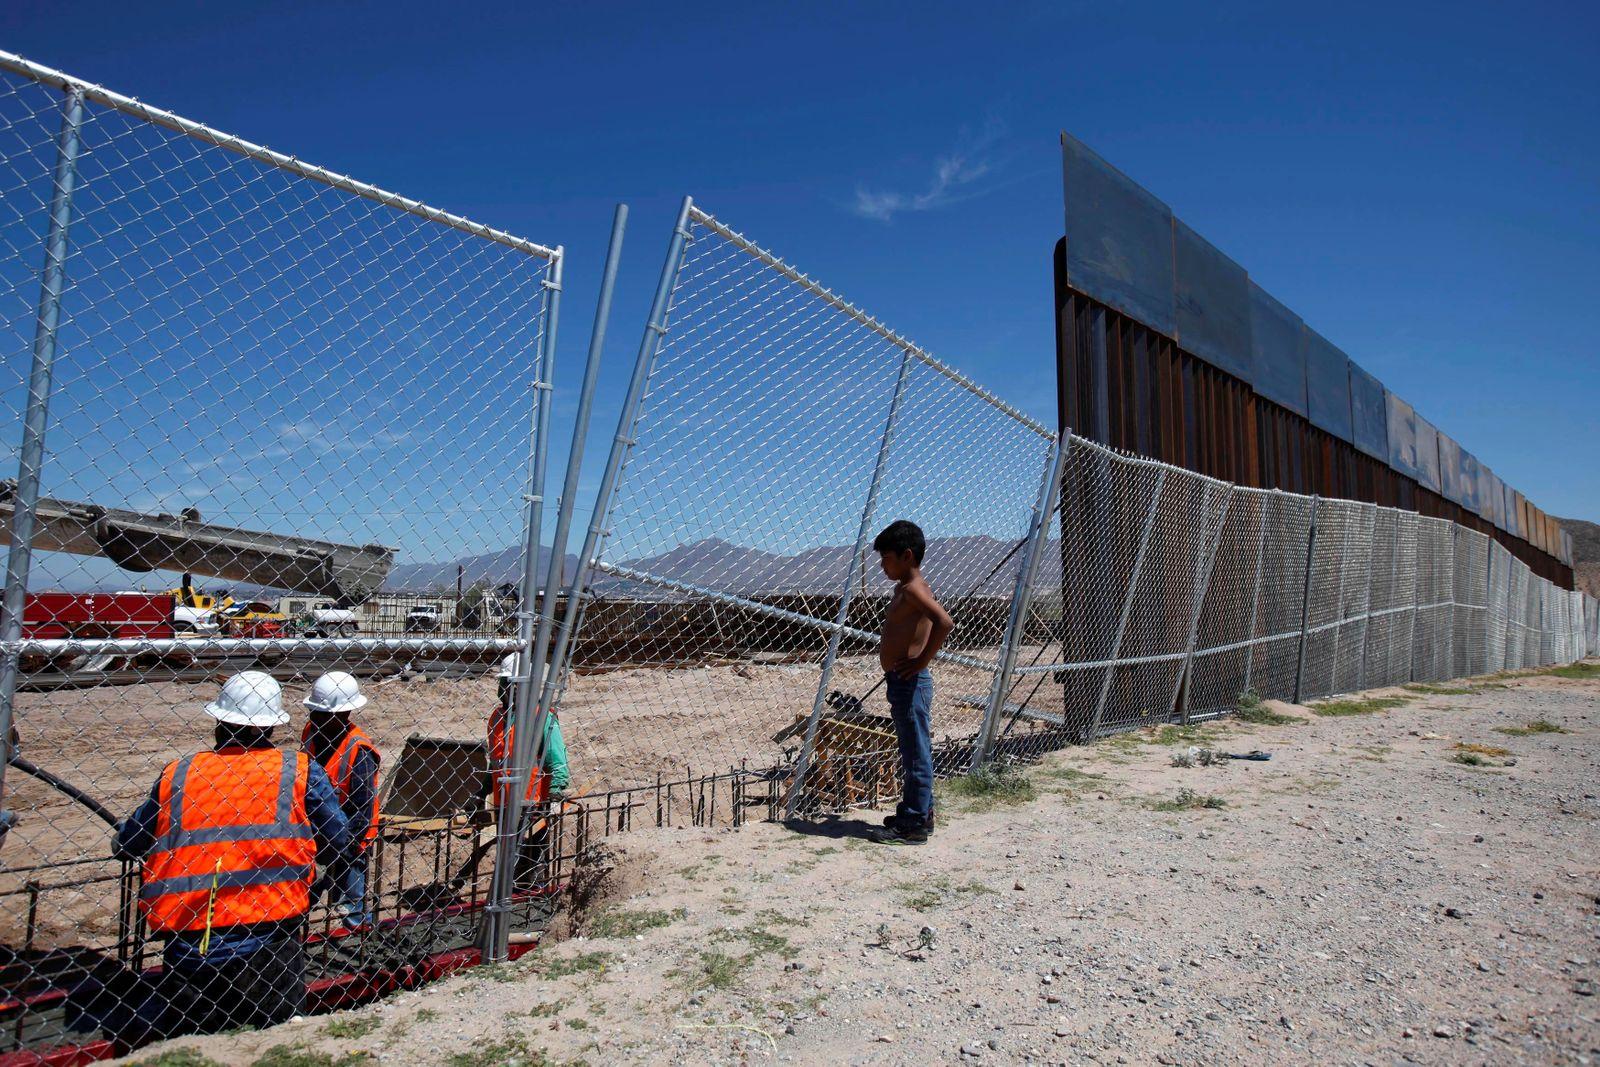 Mauerbau Mexico USA